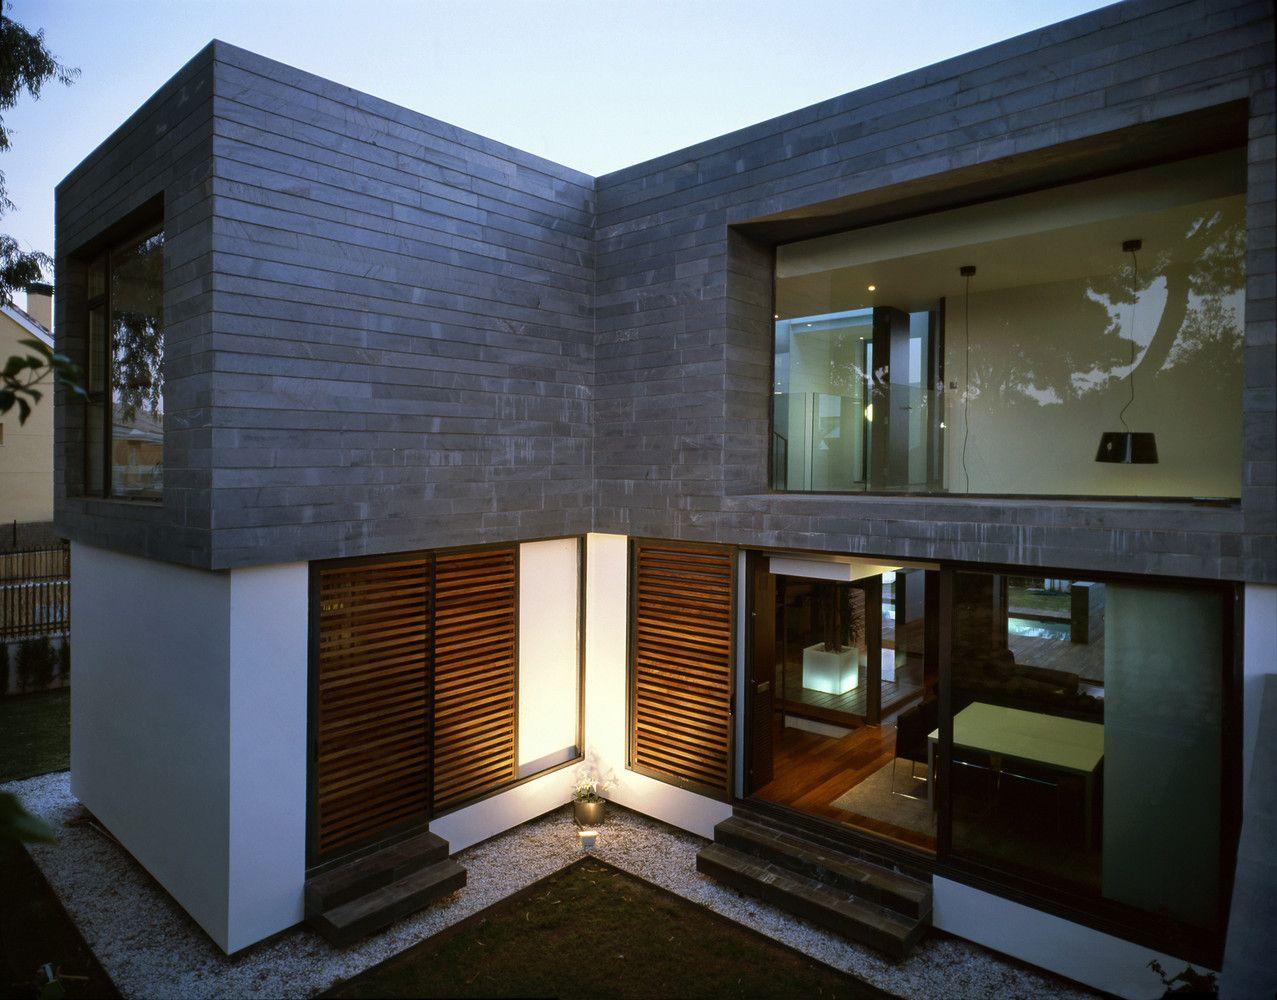 Galeria de 6 Casas geminadas + 1 Casa Isolada em Rocafort / Antonio Altarriba Comes - 11